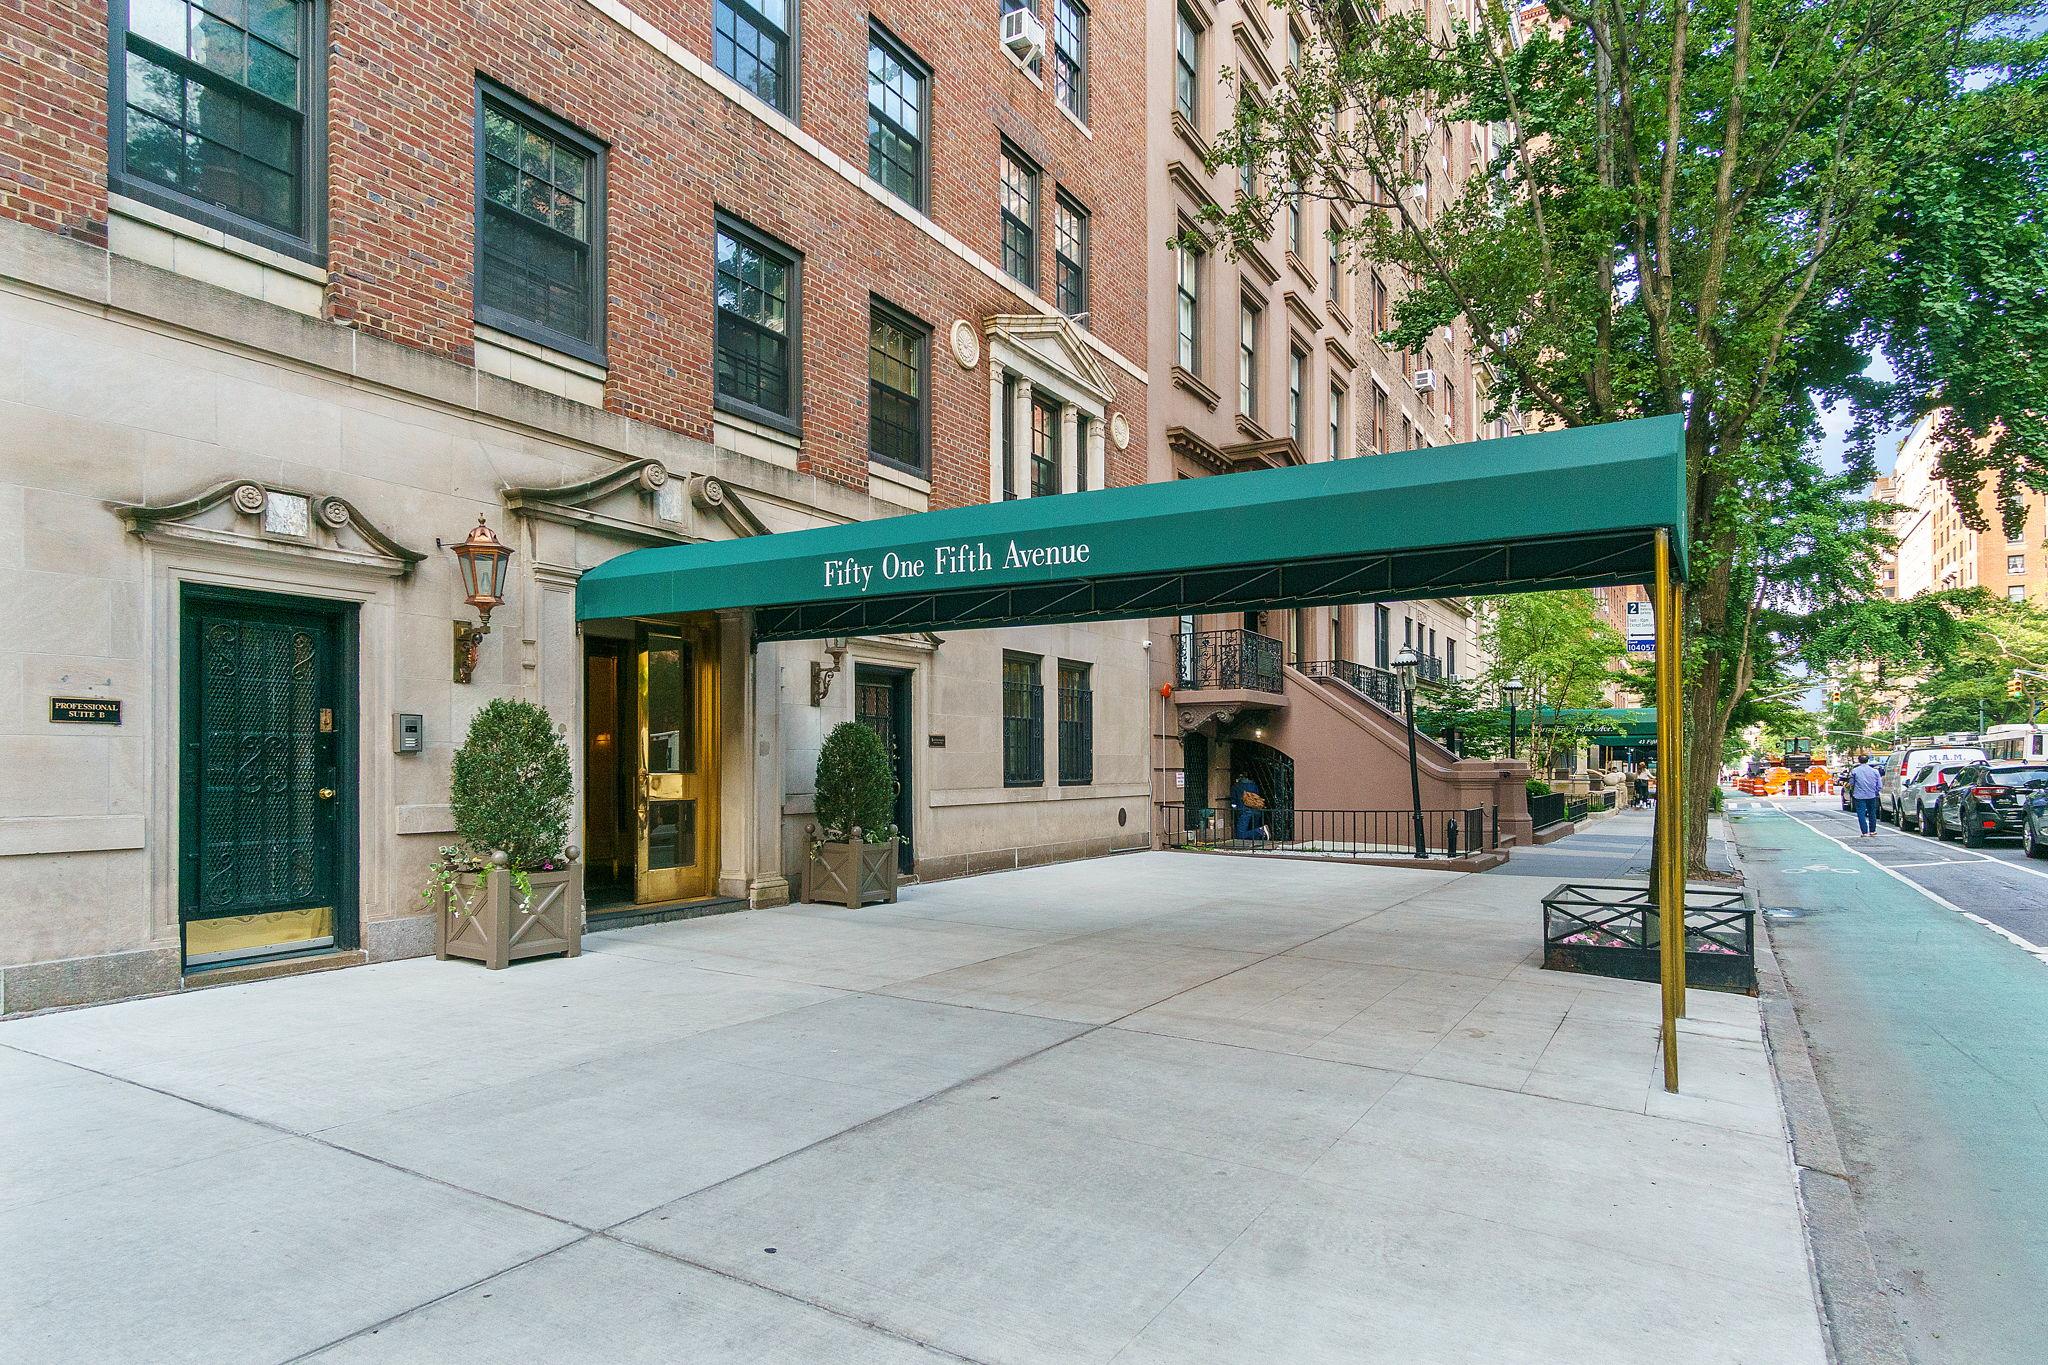 51 Fifth Avenue Greenwich Village New York NY 10003